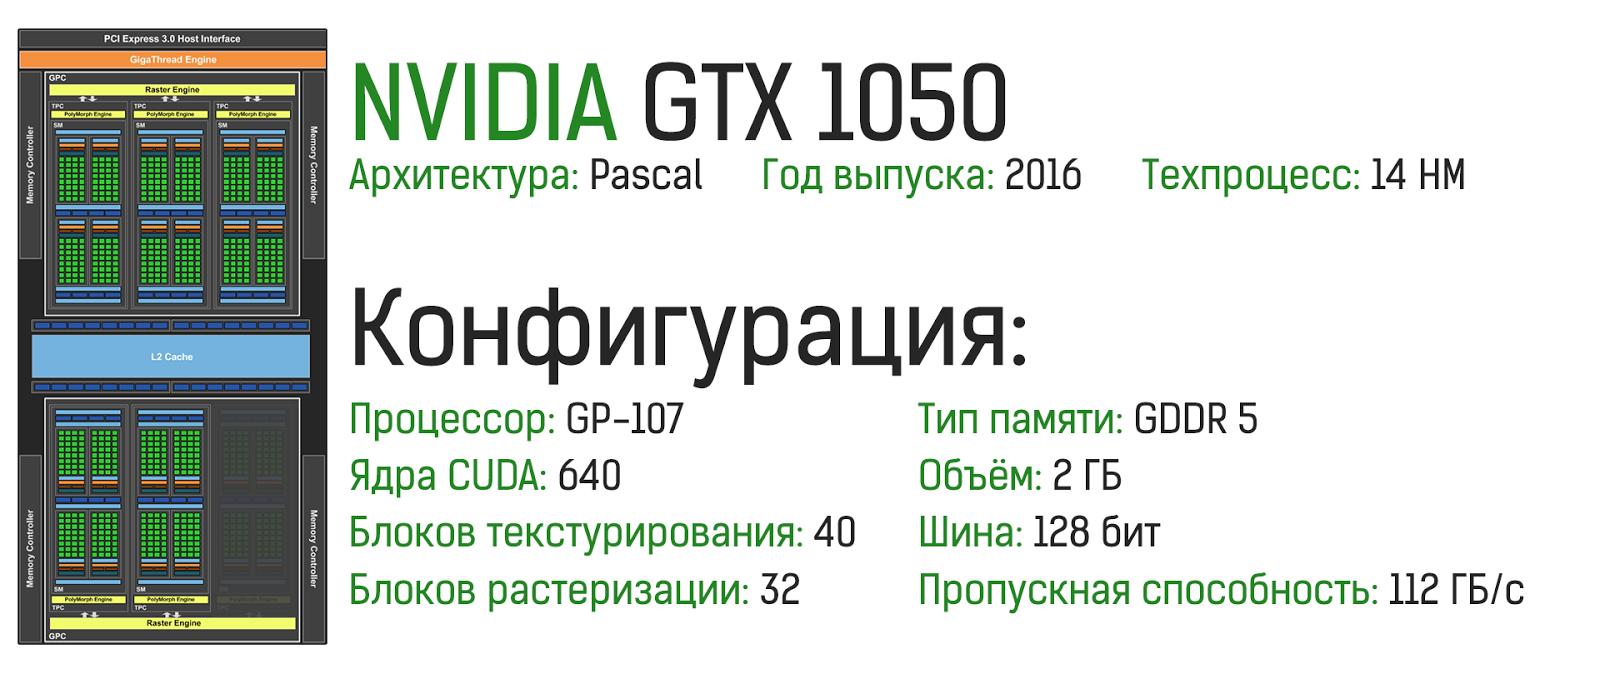 Балансируем на грани разумного с Lenovo Y520 - 18